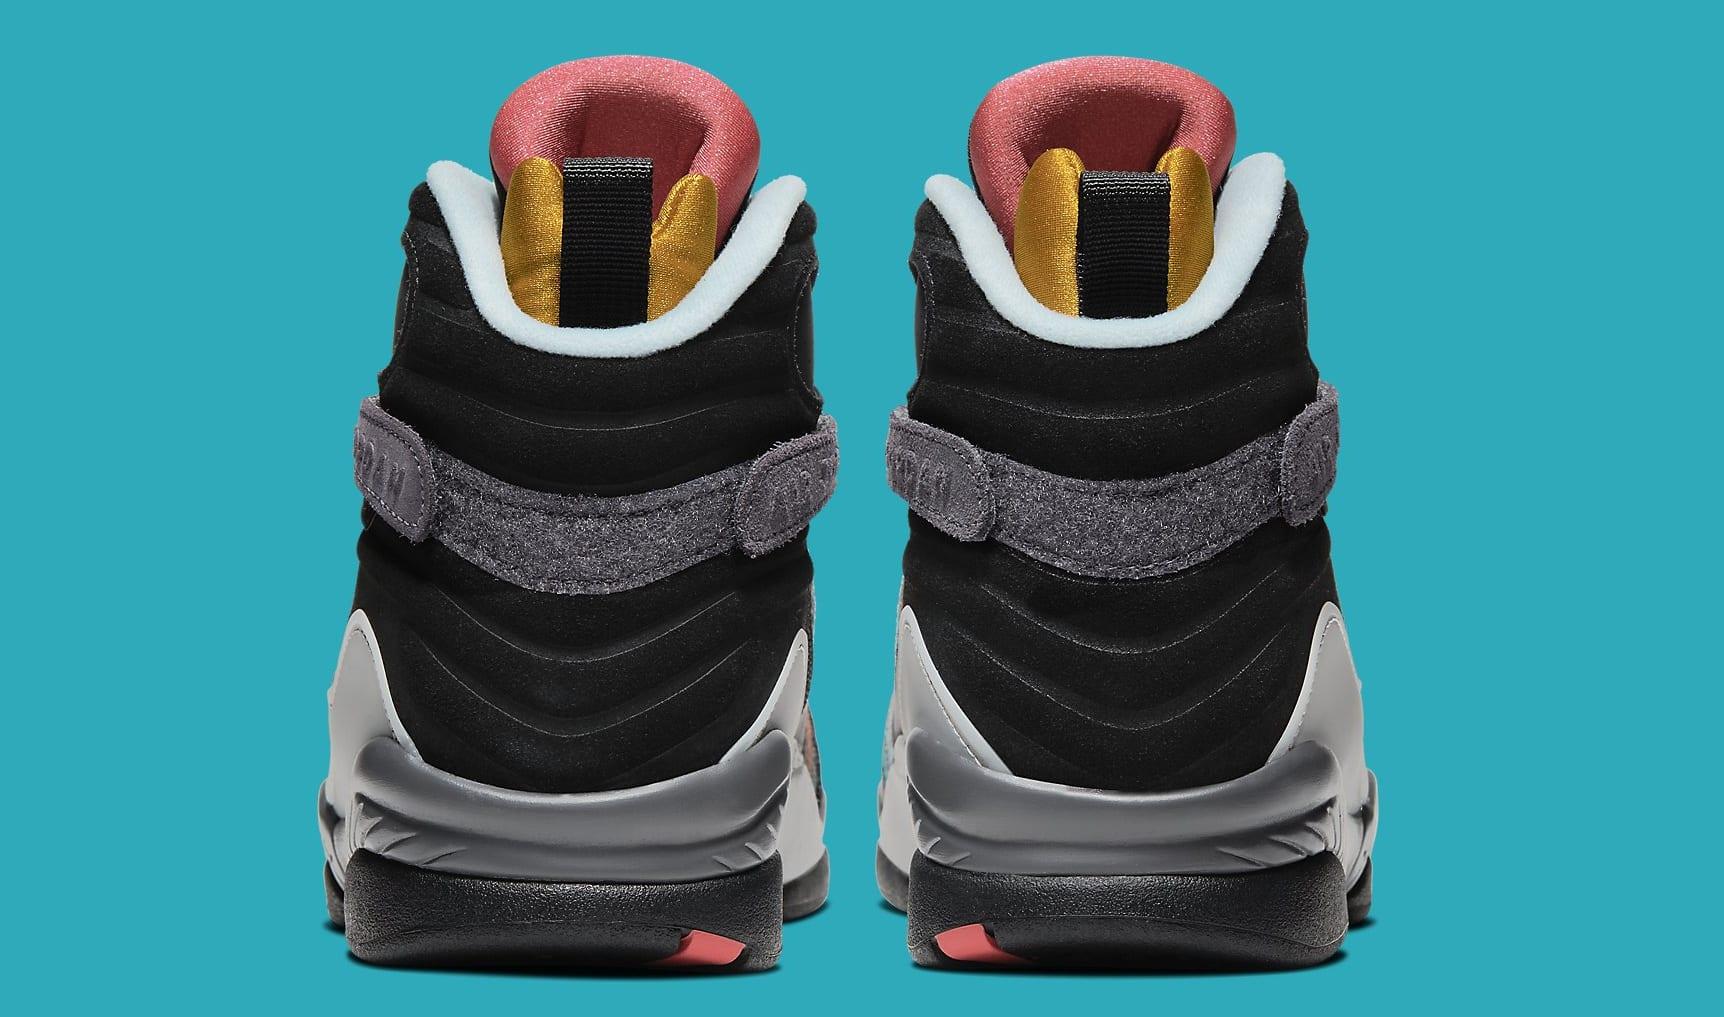 Air Jordan 8 N7 Release Date CQ9601-001 Heel